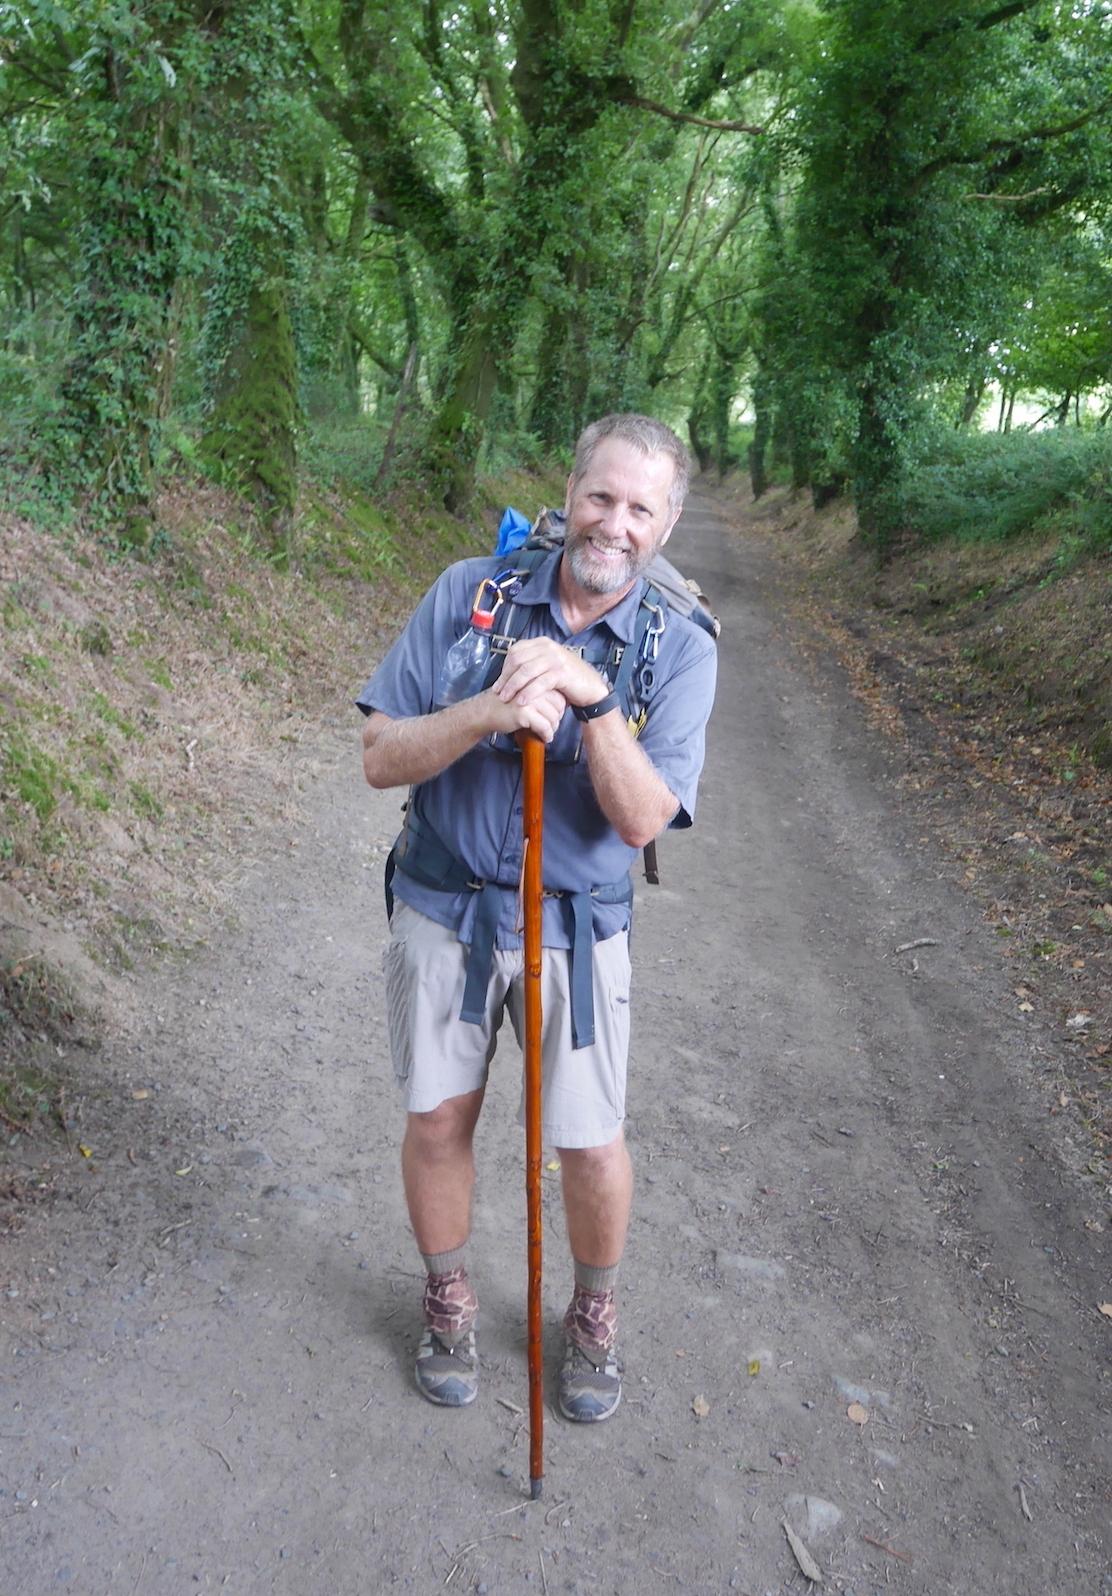 Hiking the   Camino de Santiago francés  across Spain.